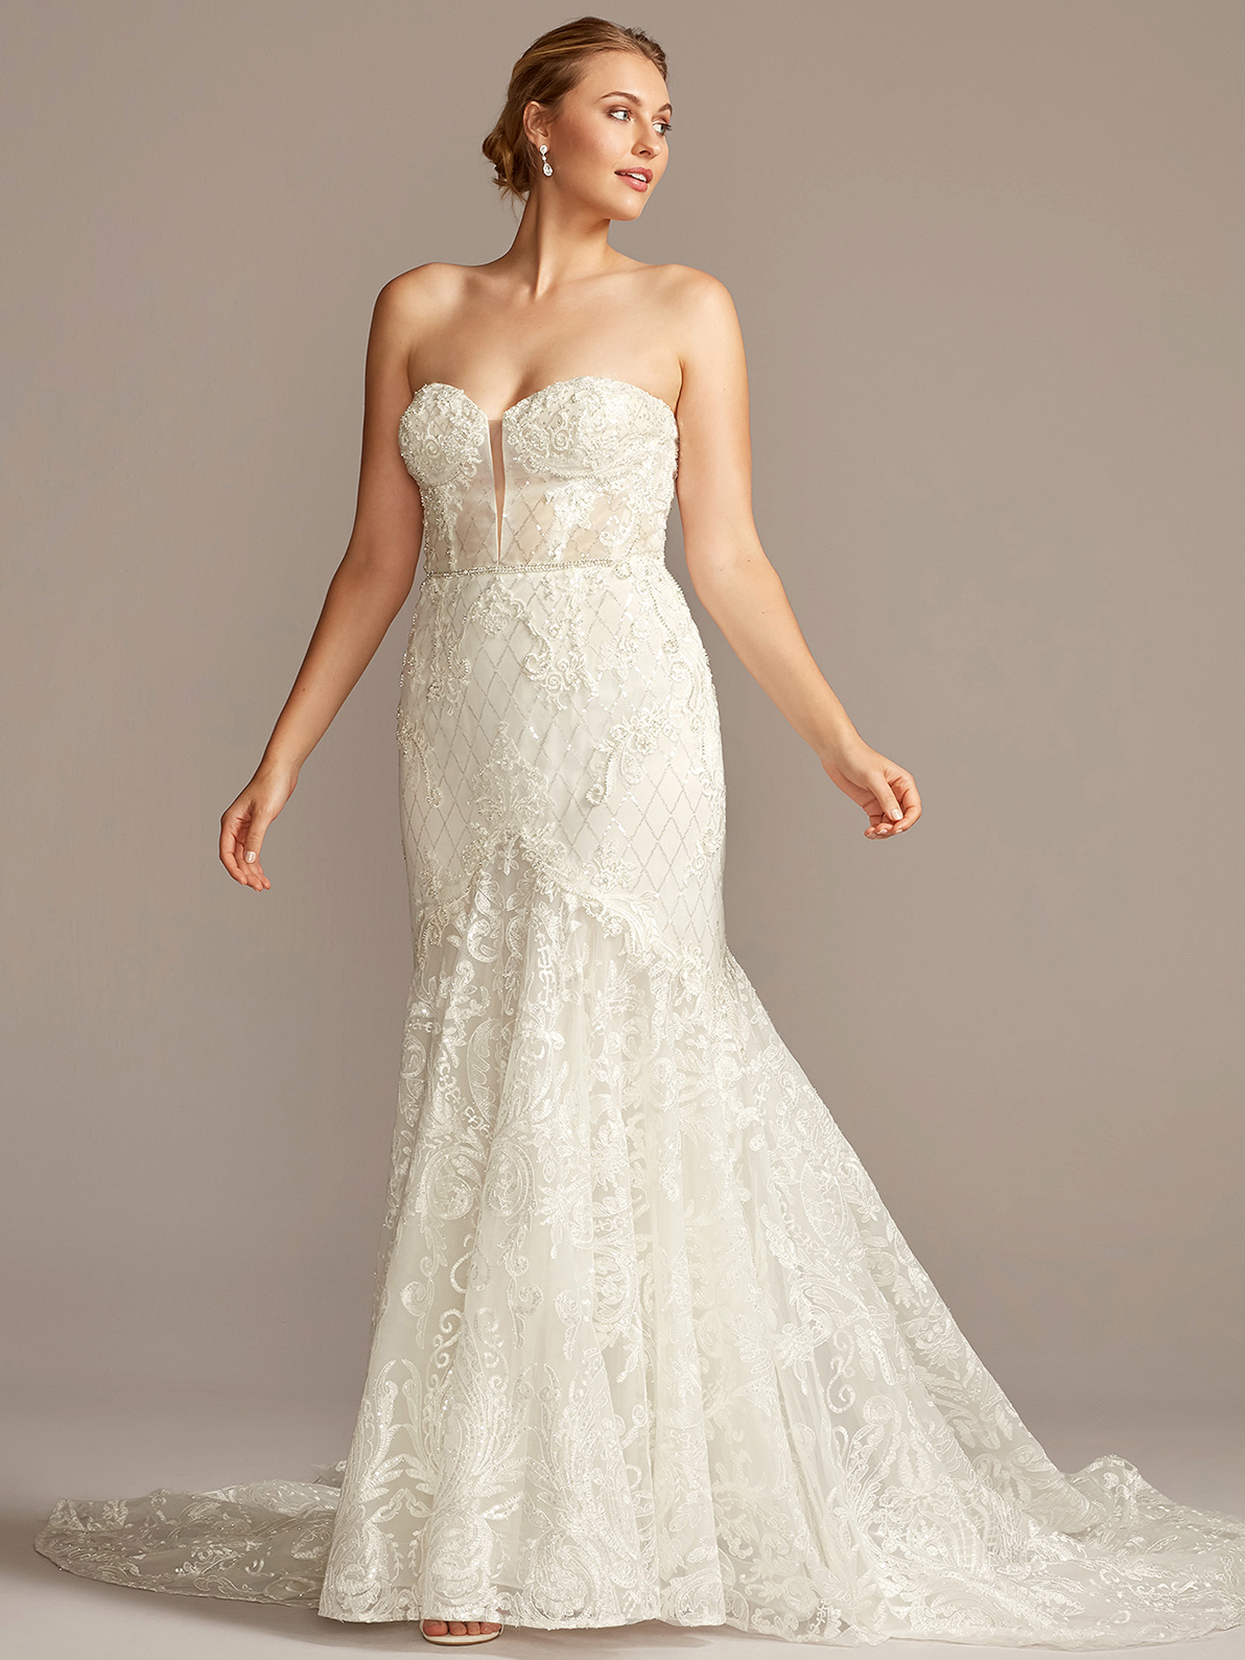 davids bridal galina strapless embroidered trumpet wedding dress fall 2020